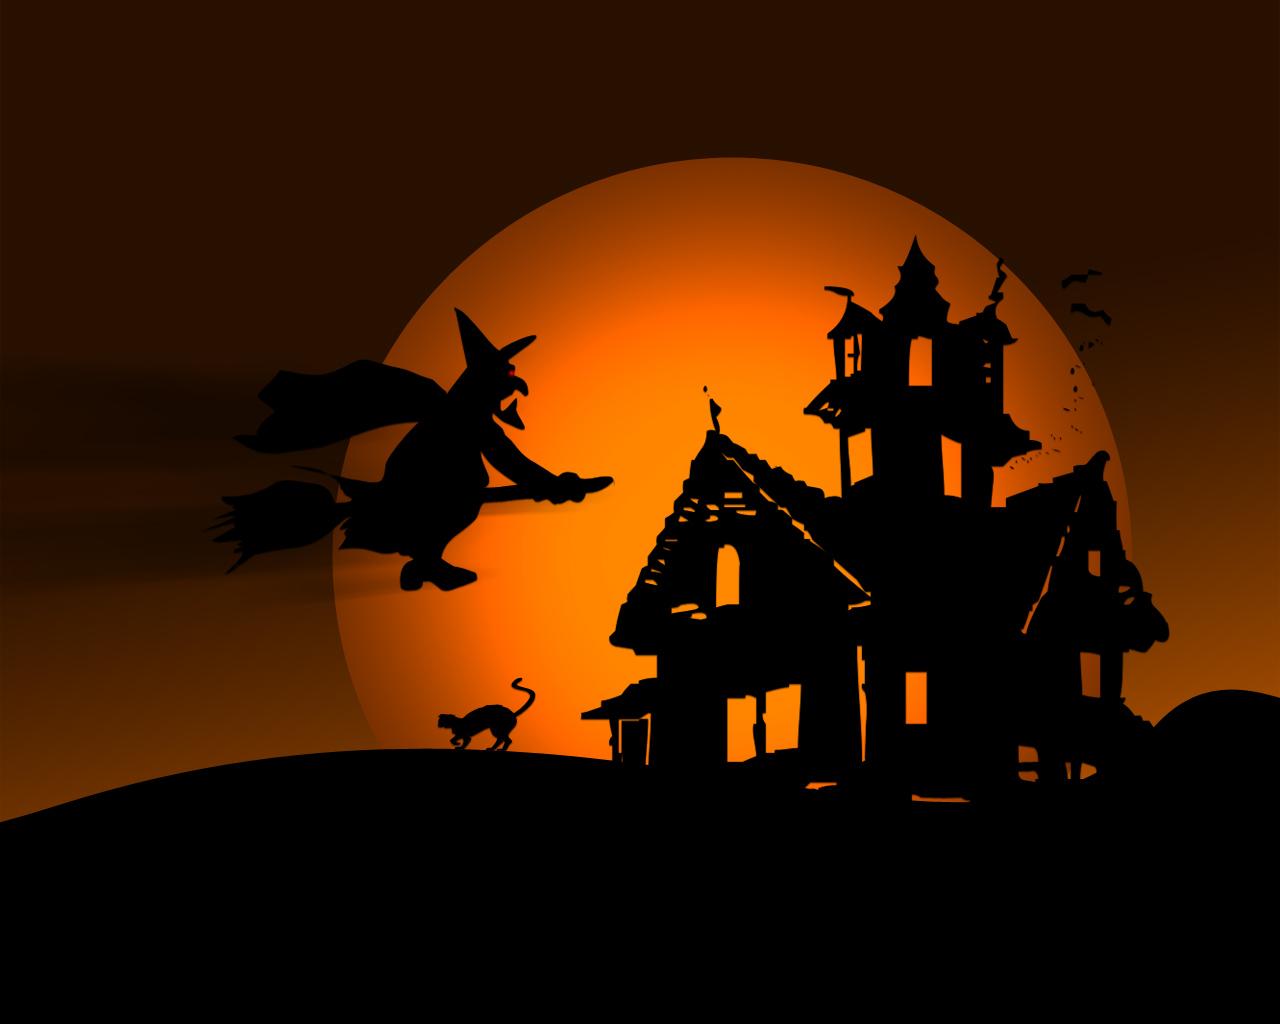 http://4.bp.blogspot.com/-my0lnDSa5CM/TnpurTBGIRI/AAAAAAAAANc/k0qyspIhGok/s1600/halloween-wallpaper-55.jpg